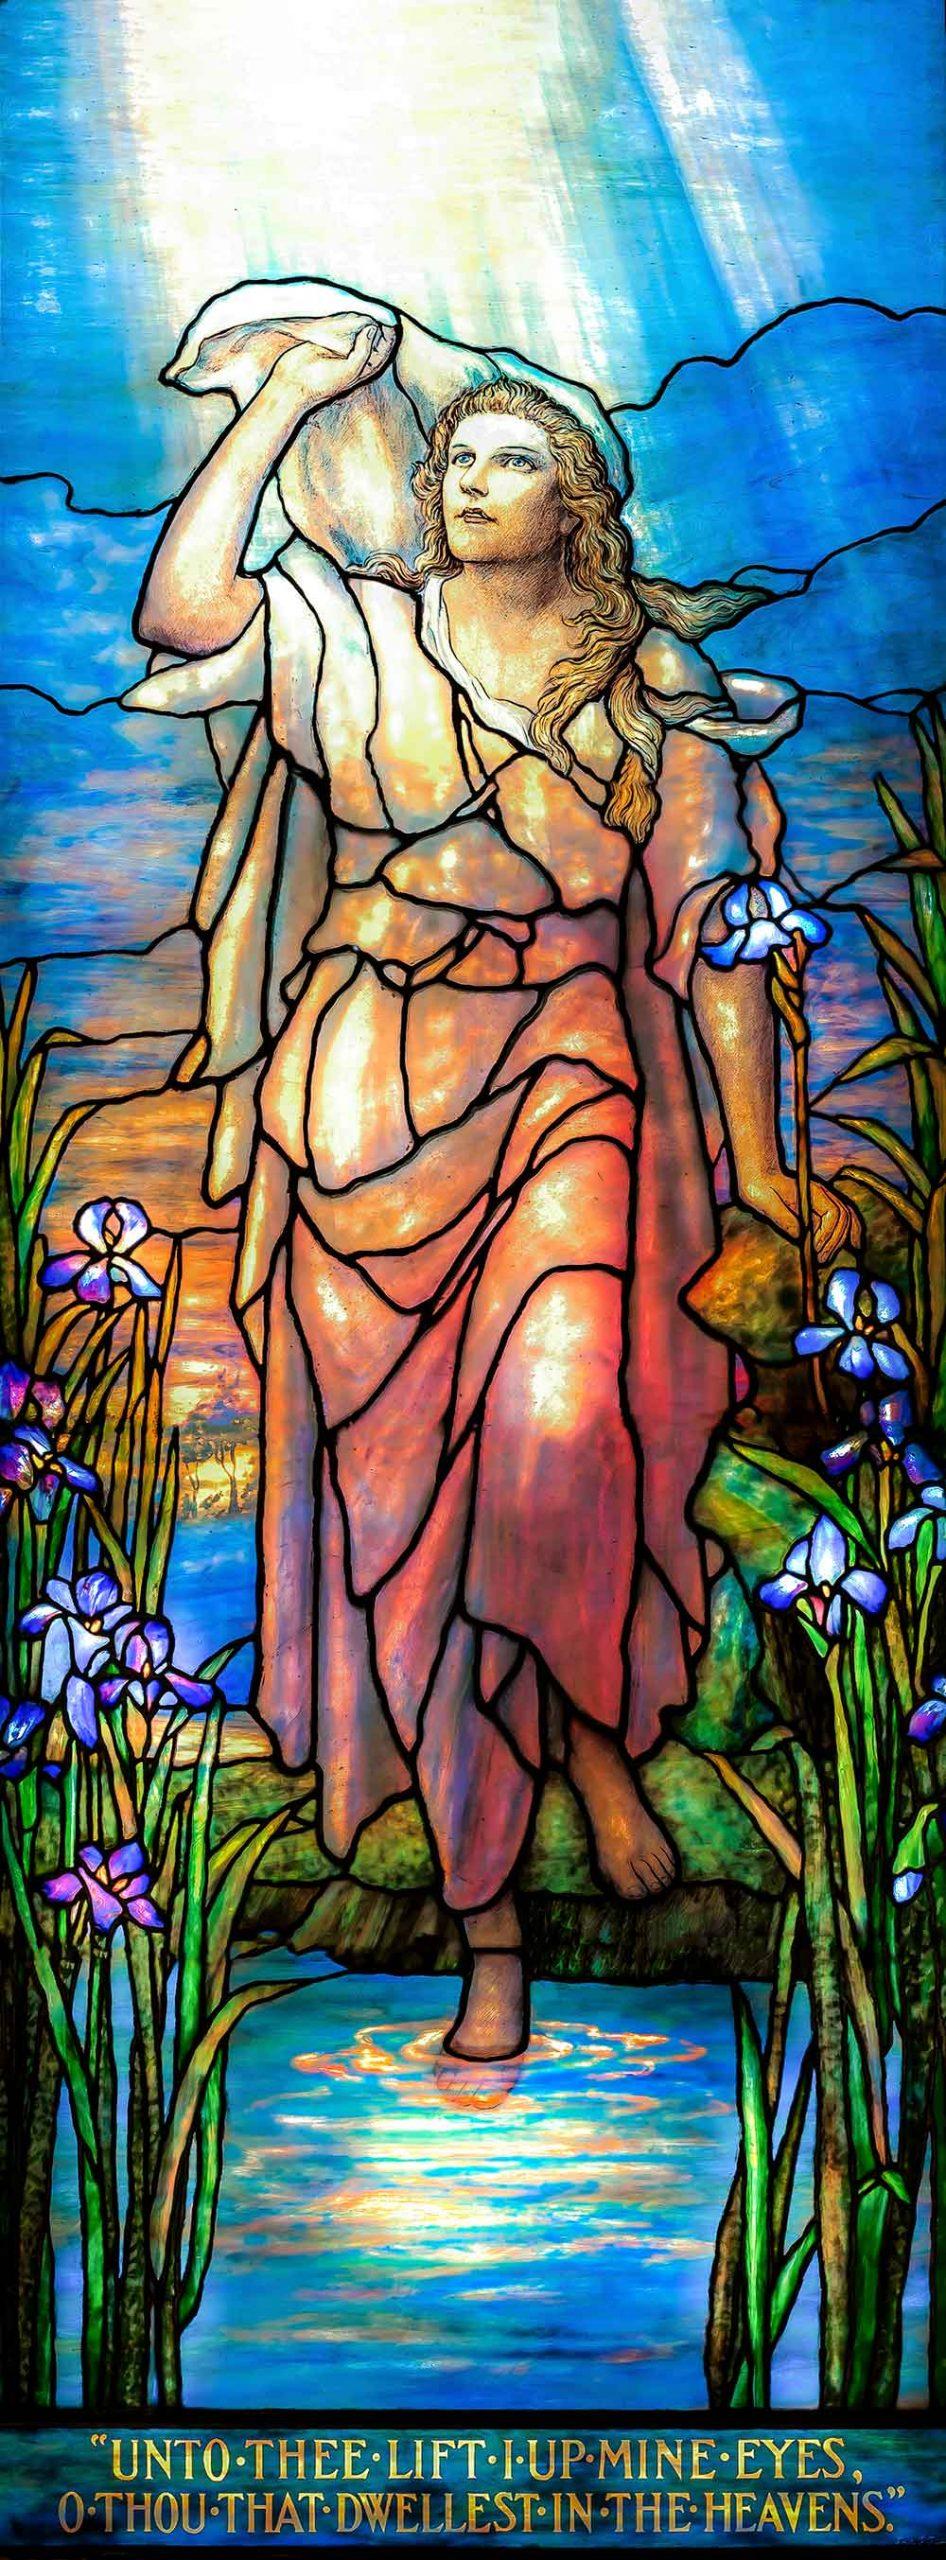 Tiffany-Woman-at-Pond-Lift-up-mine-Eyes